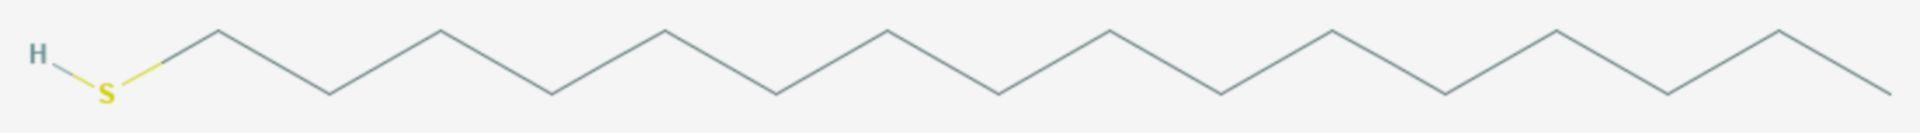 Hexadecanthiol (Strukturformel)